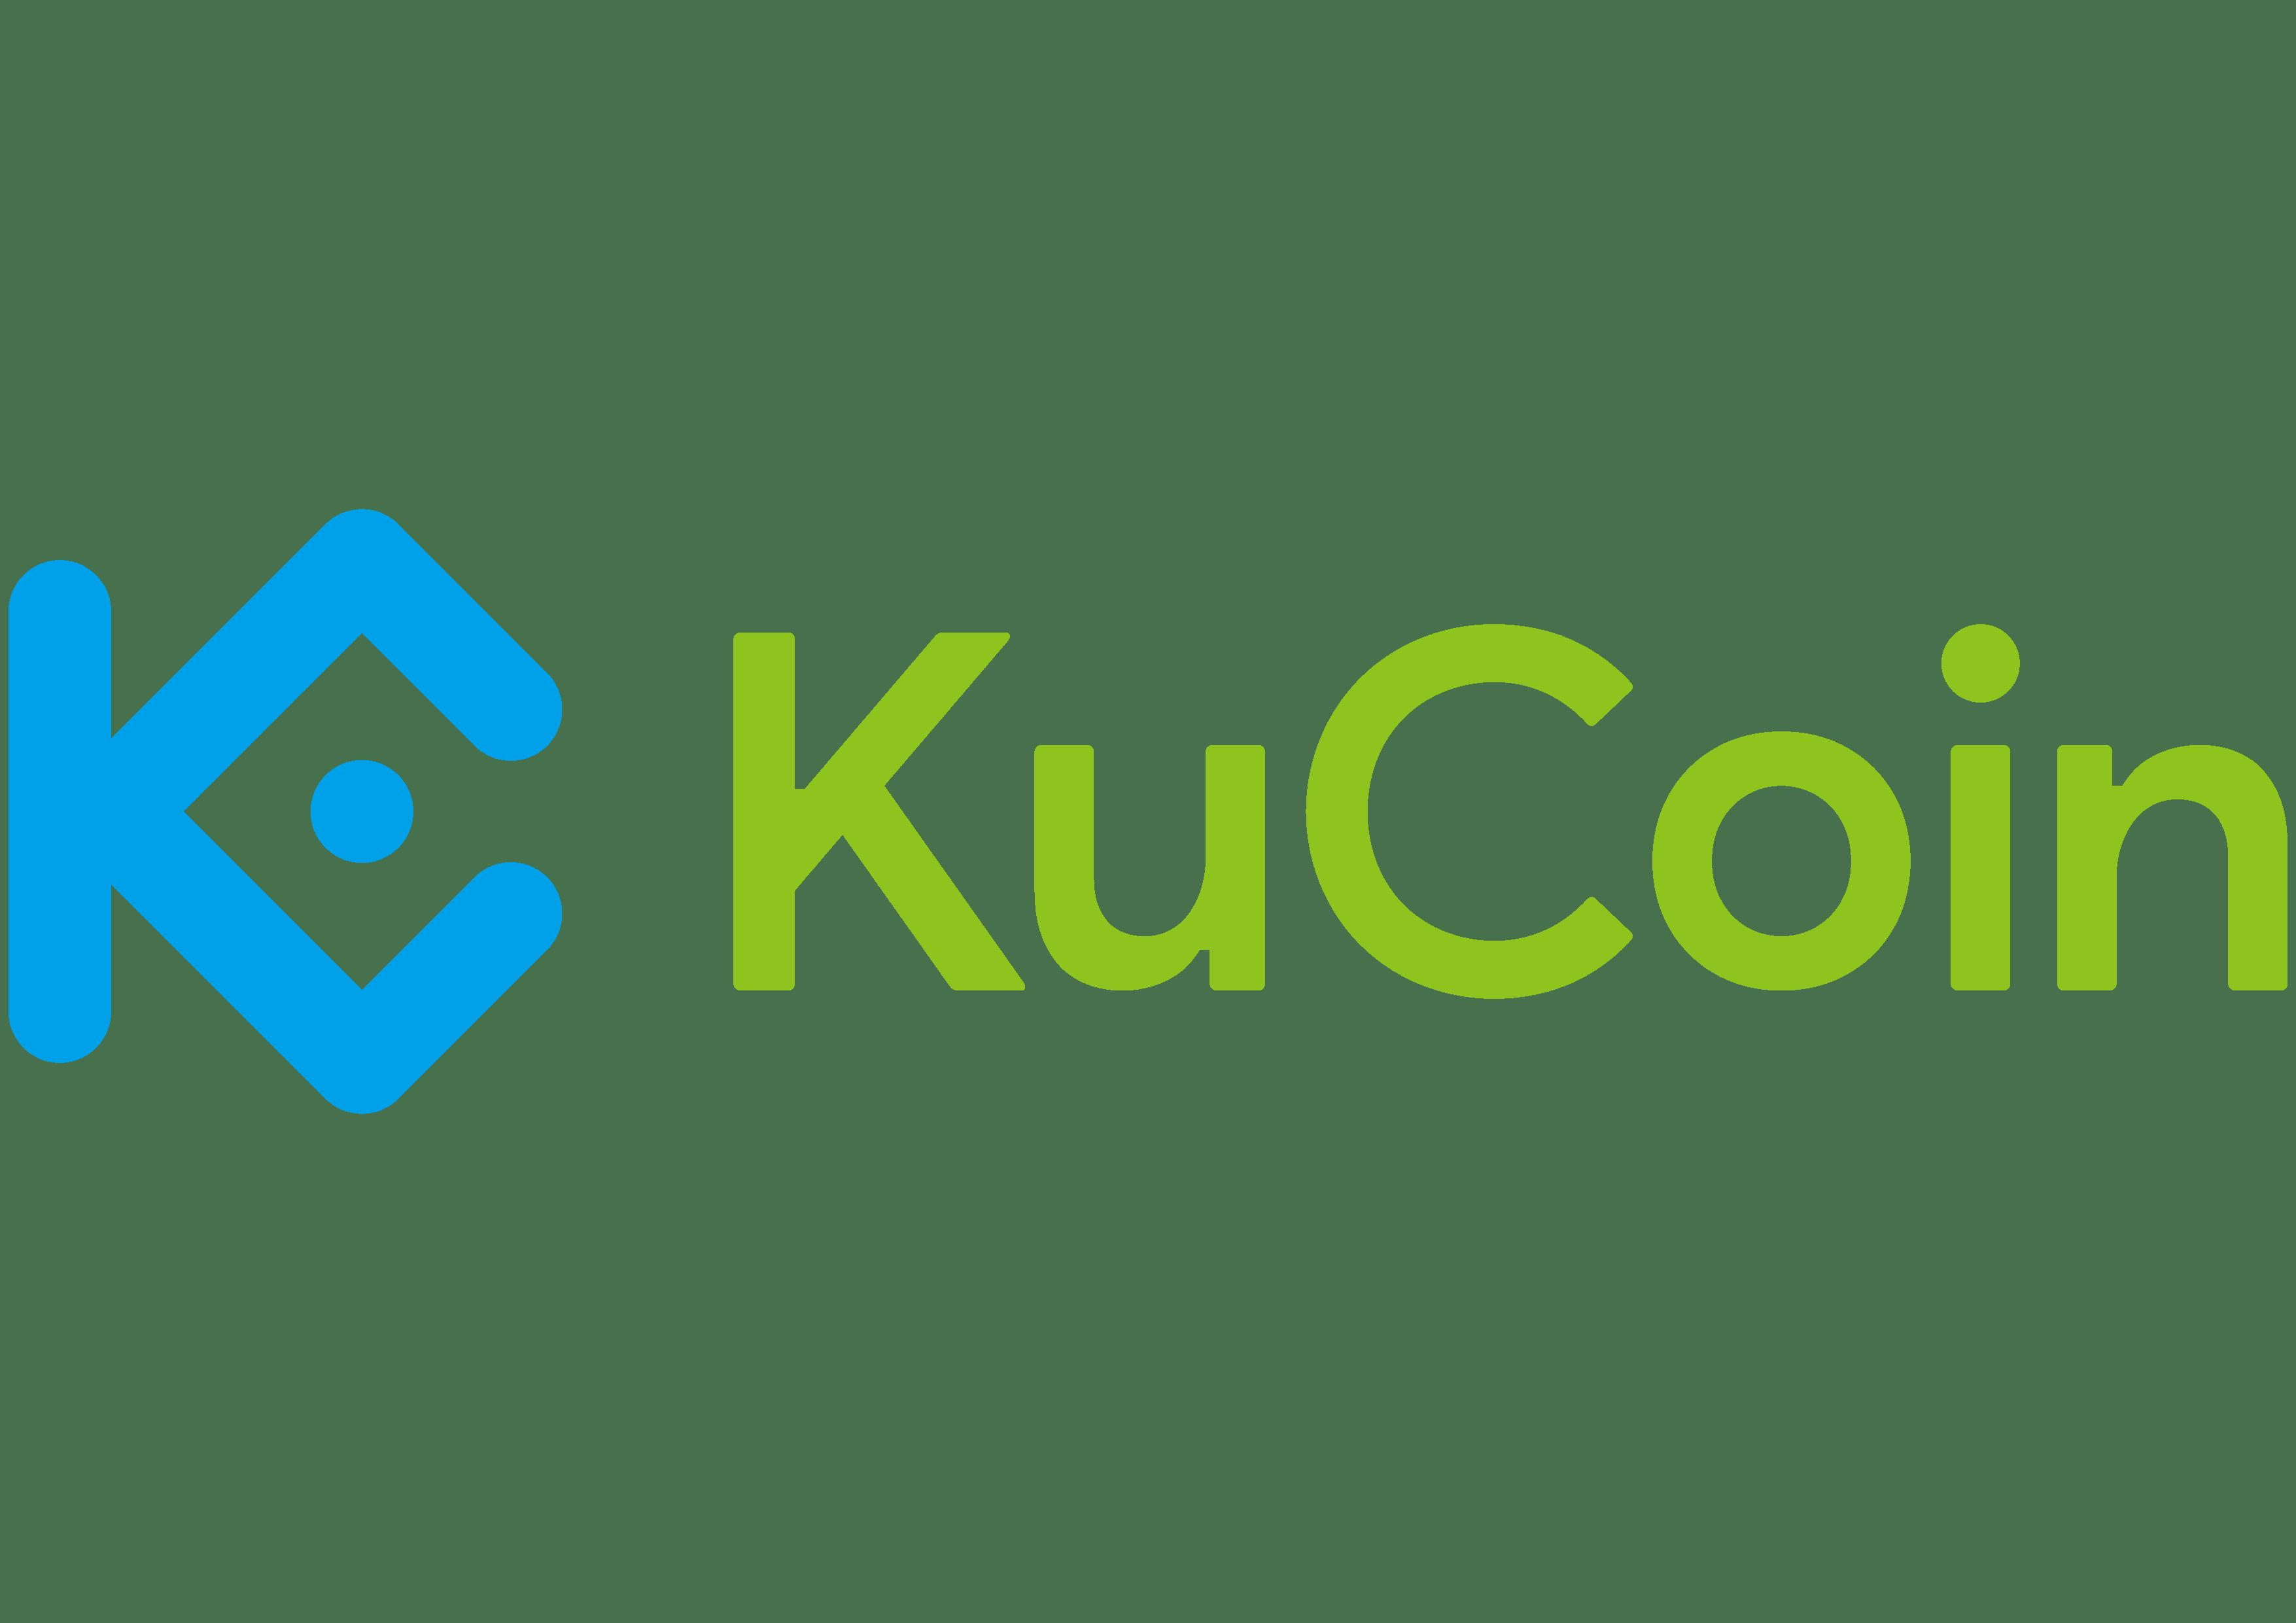 Logo KuCoin Shares